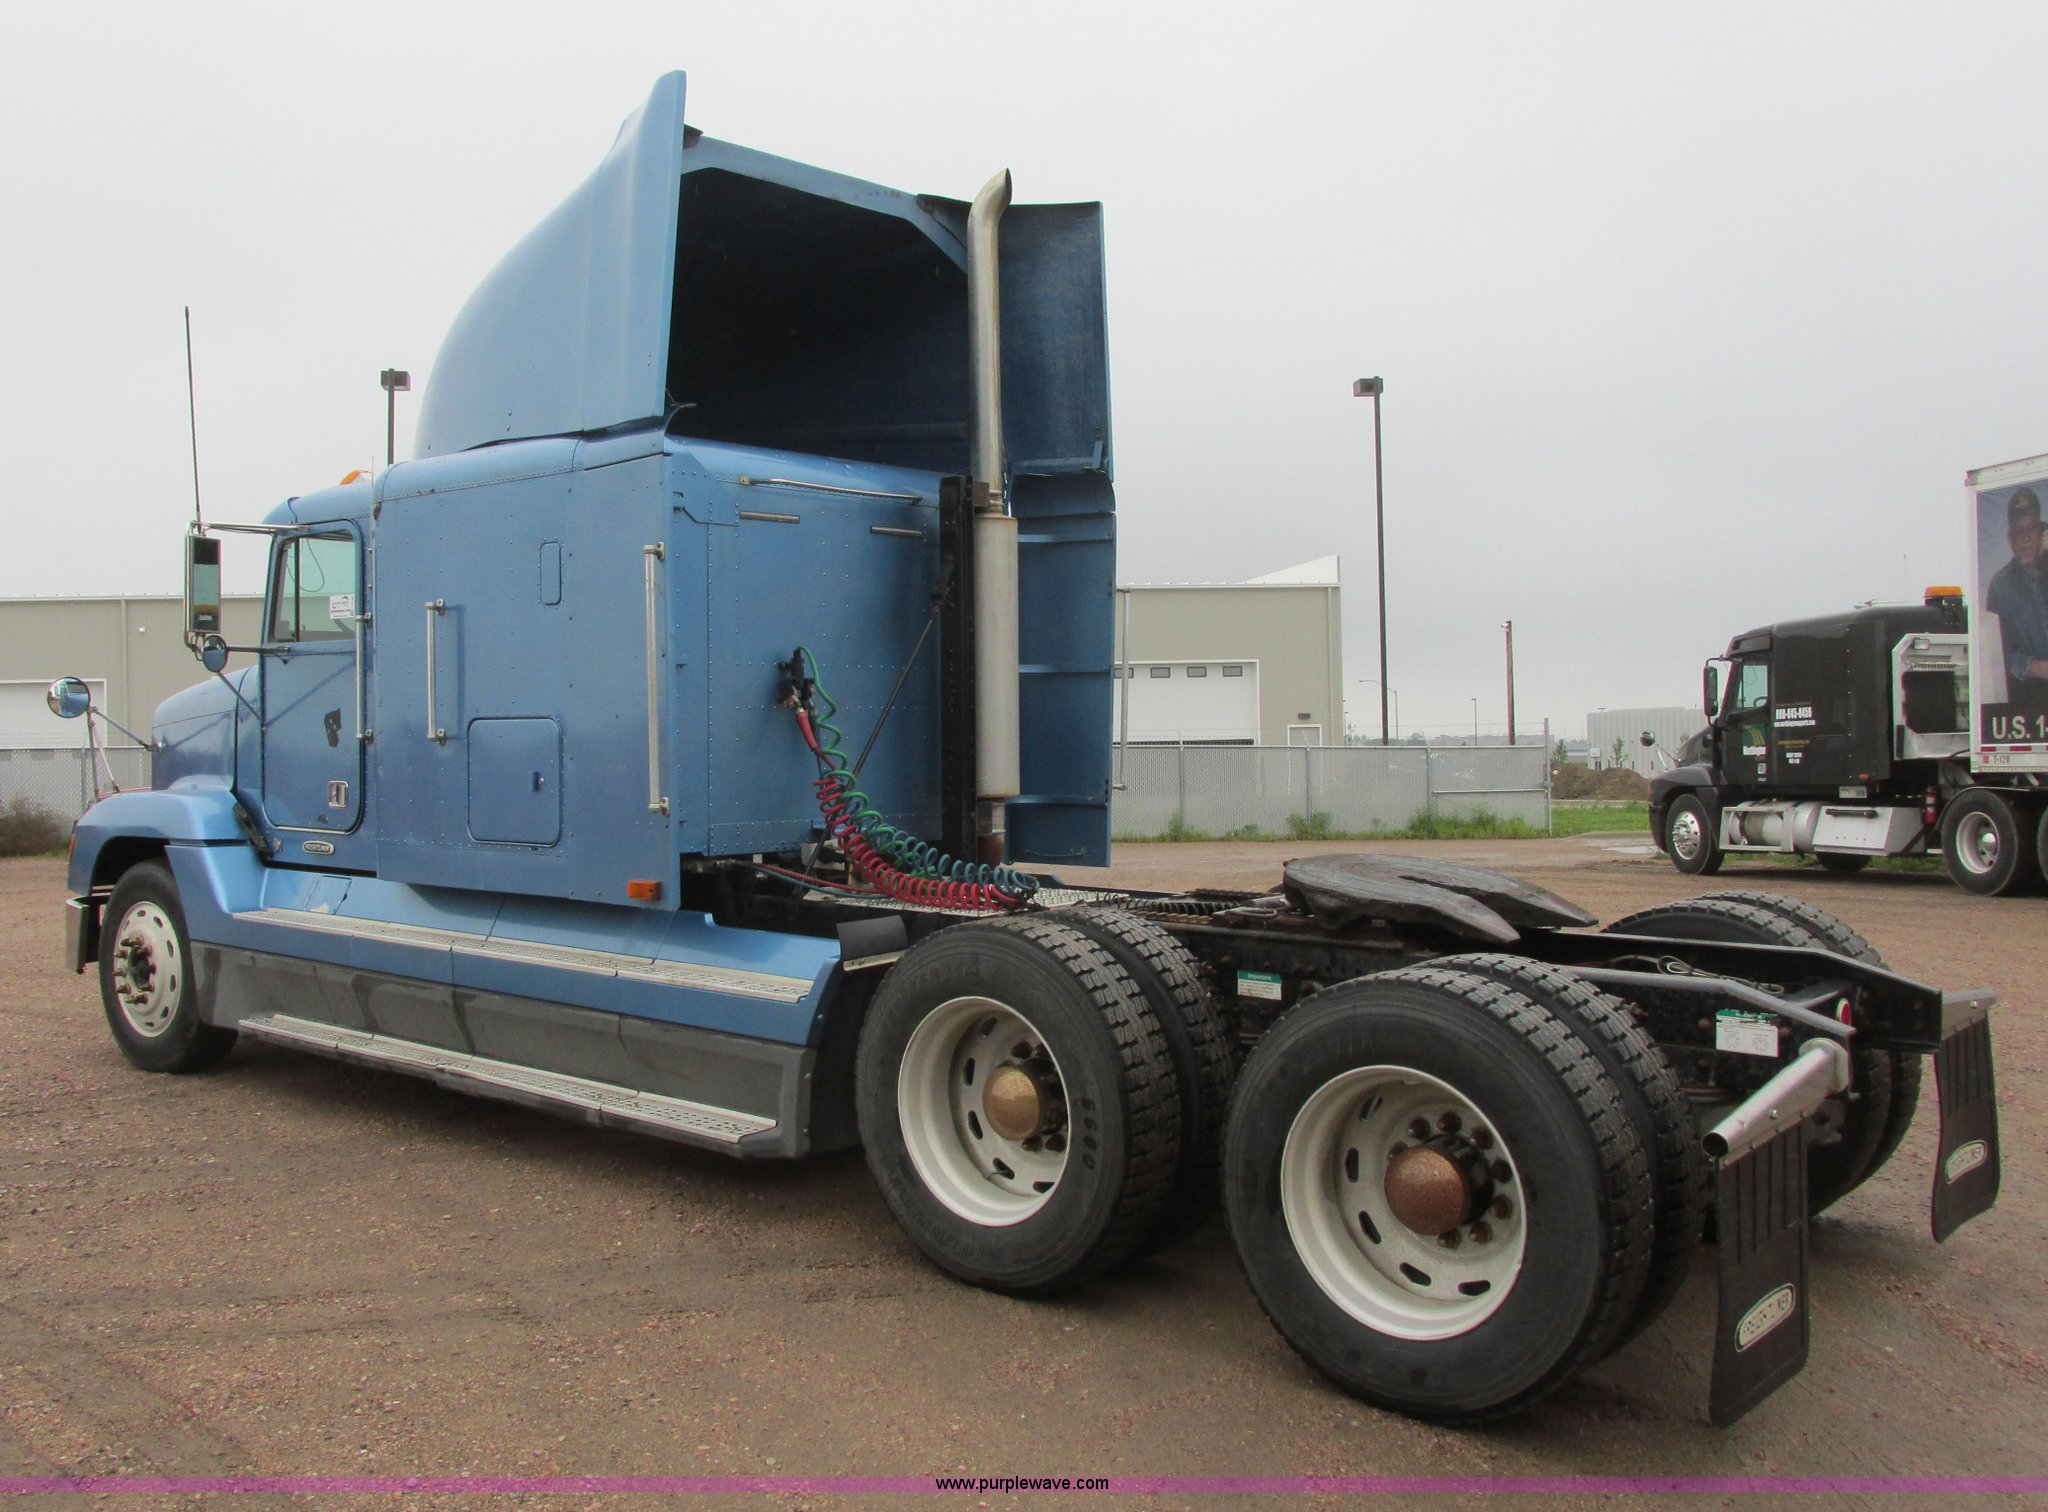 ... 1998 Freightliner FLD120 semi truck Full size in new window ...